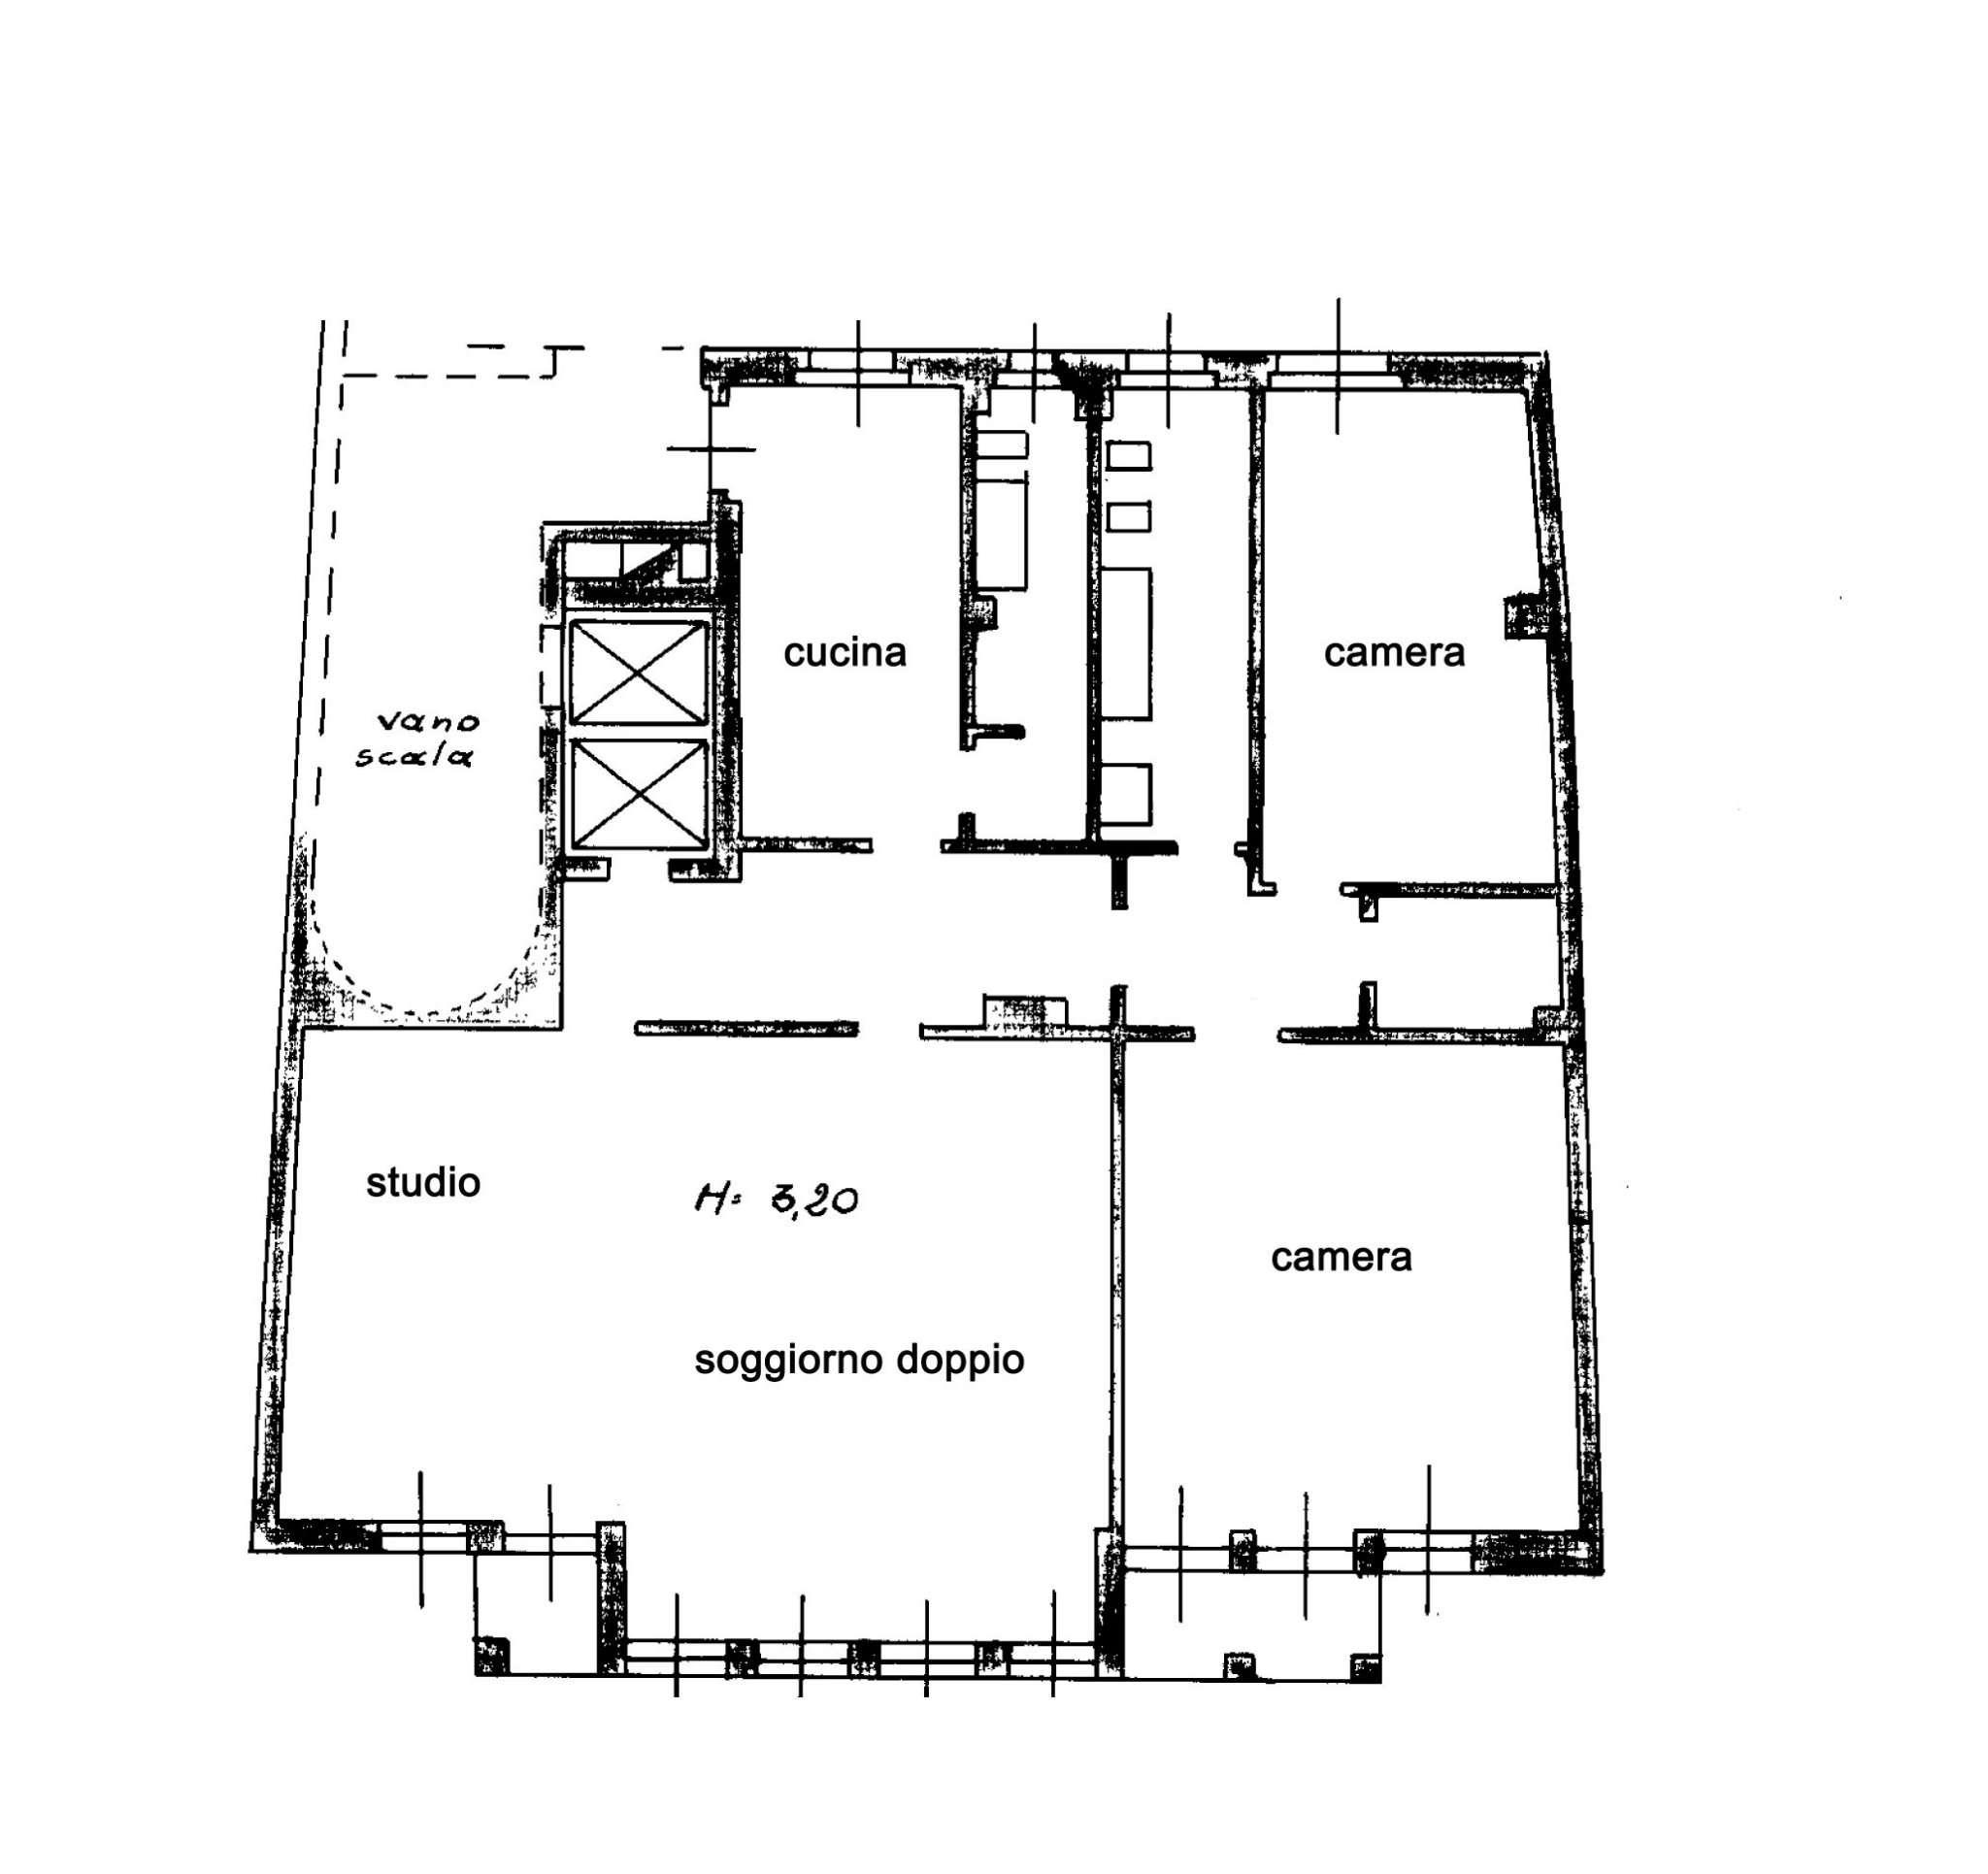 Planimetria appartamentoVia San Giovanni Sul Muro 20121